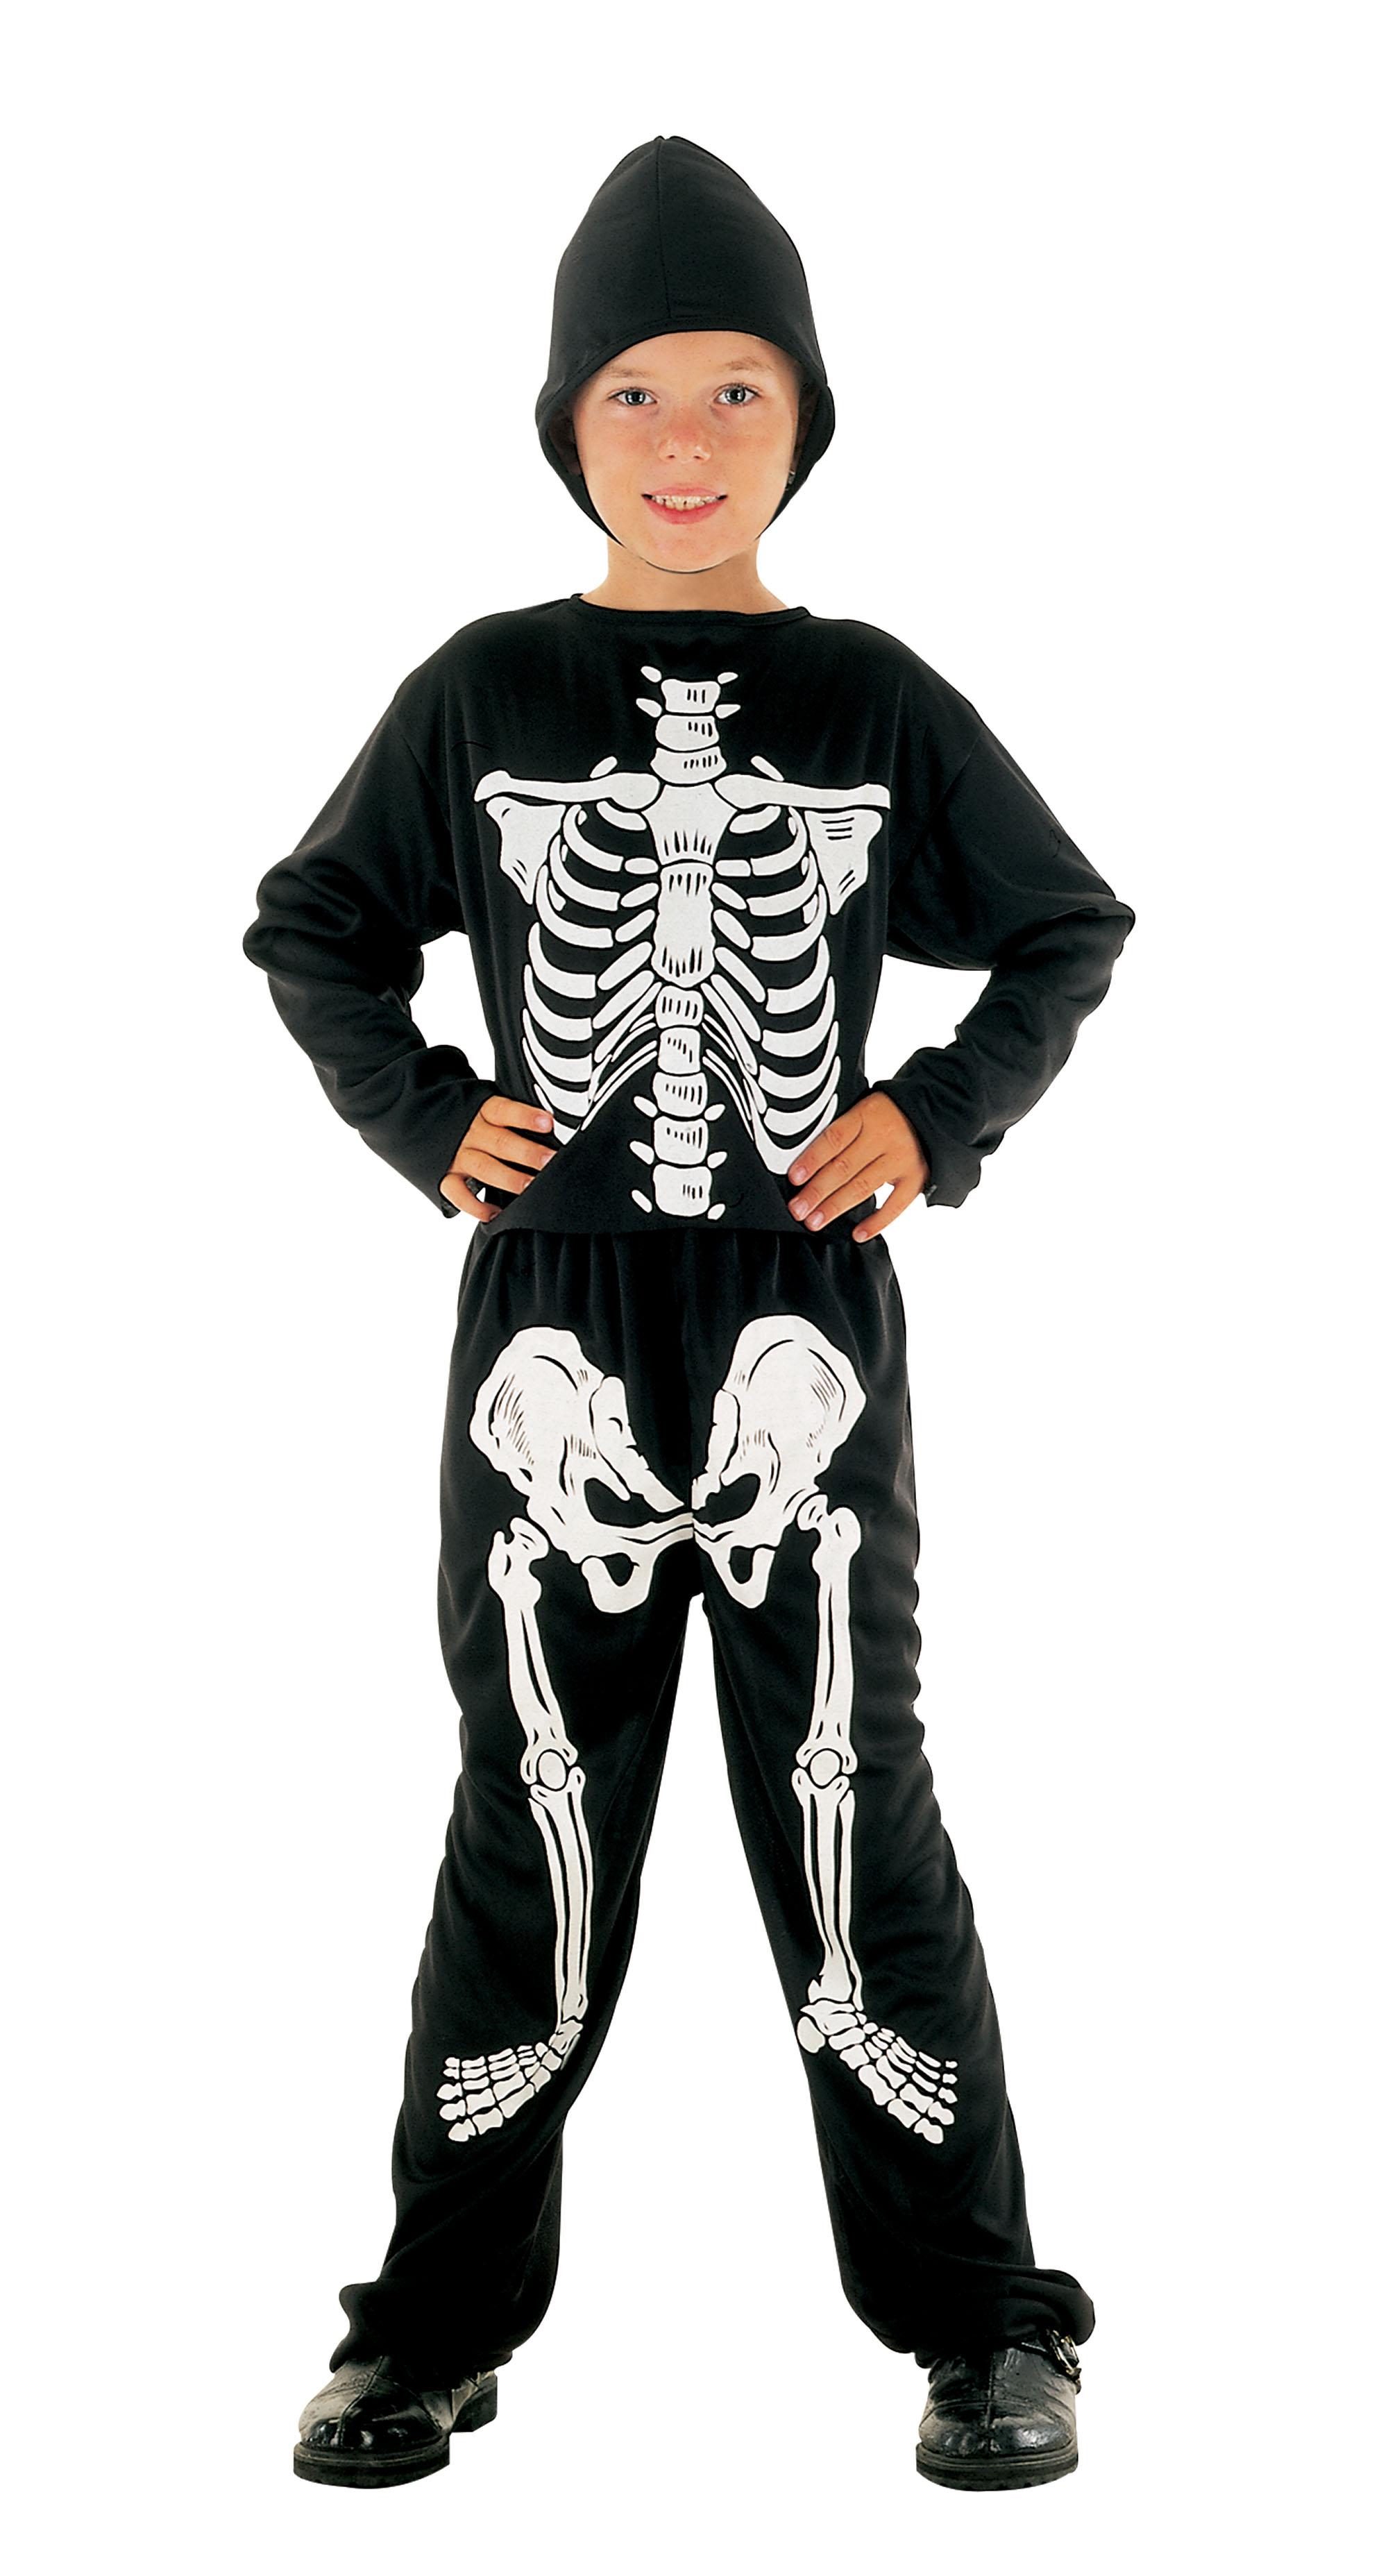 Childs Skeleton Costume